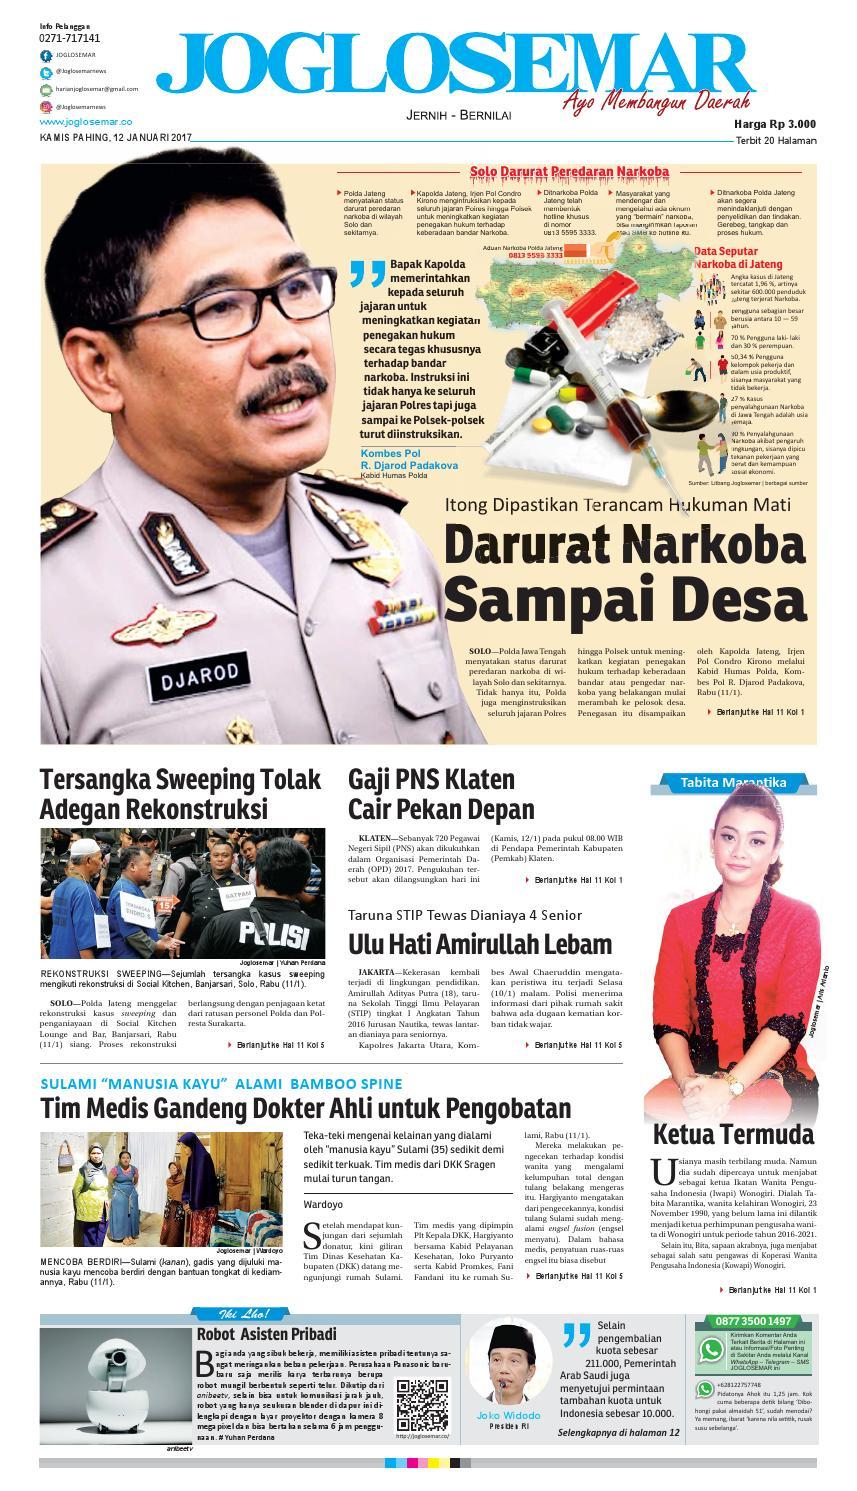 E Paper 12 Januari 2017 By Pt Joglosemar Prima Media Issuu Produk Ukm Bumn Telur Ayam Segar Ampamp  Depok